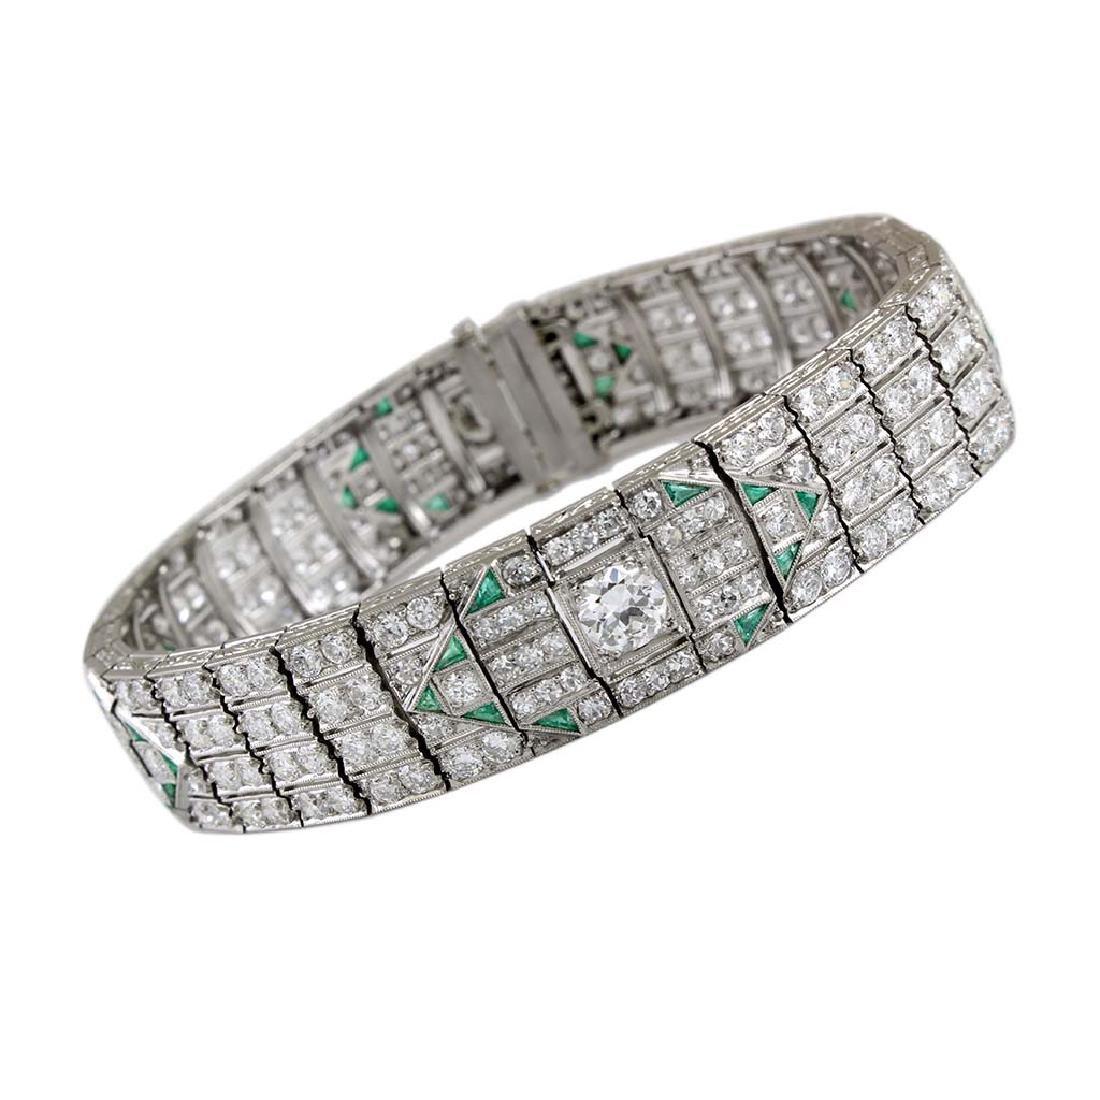 Art Deco Diamond Emerald Platinum Bracelet - 3